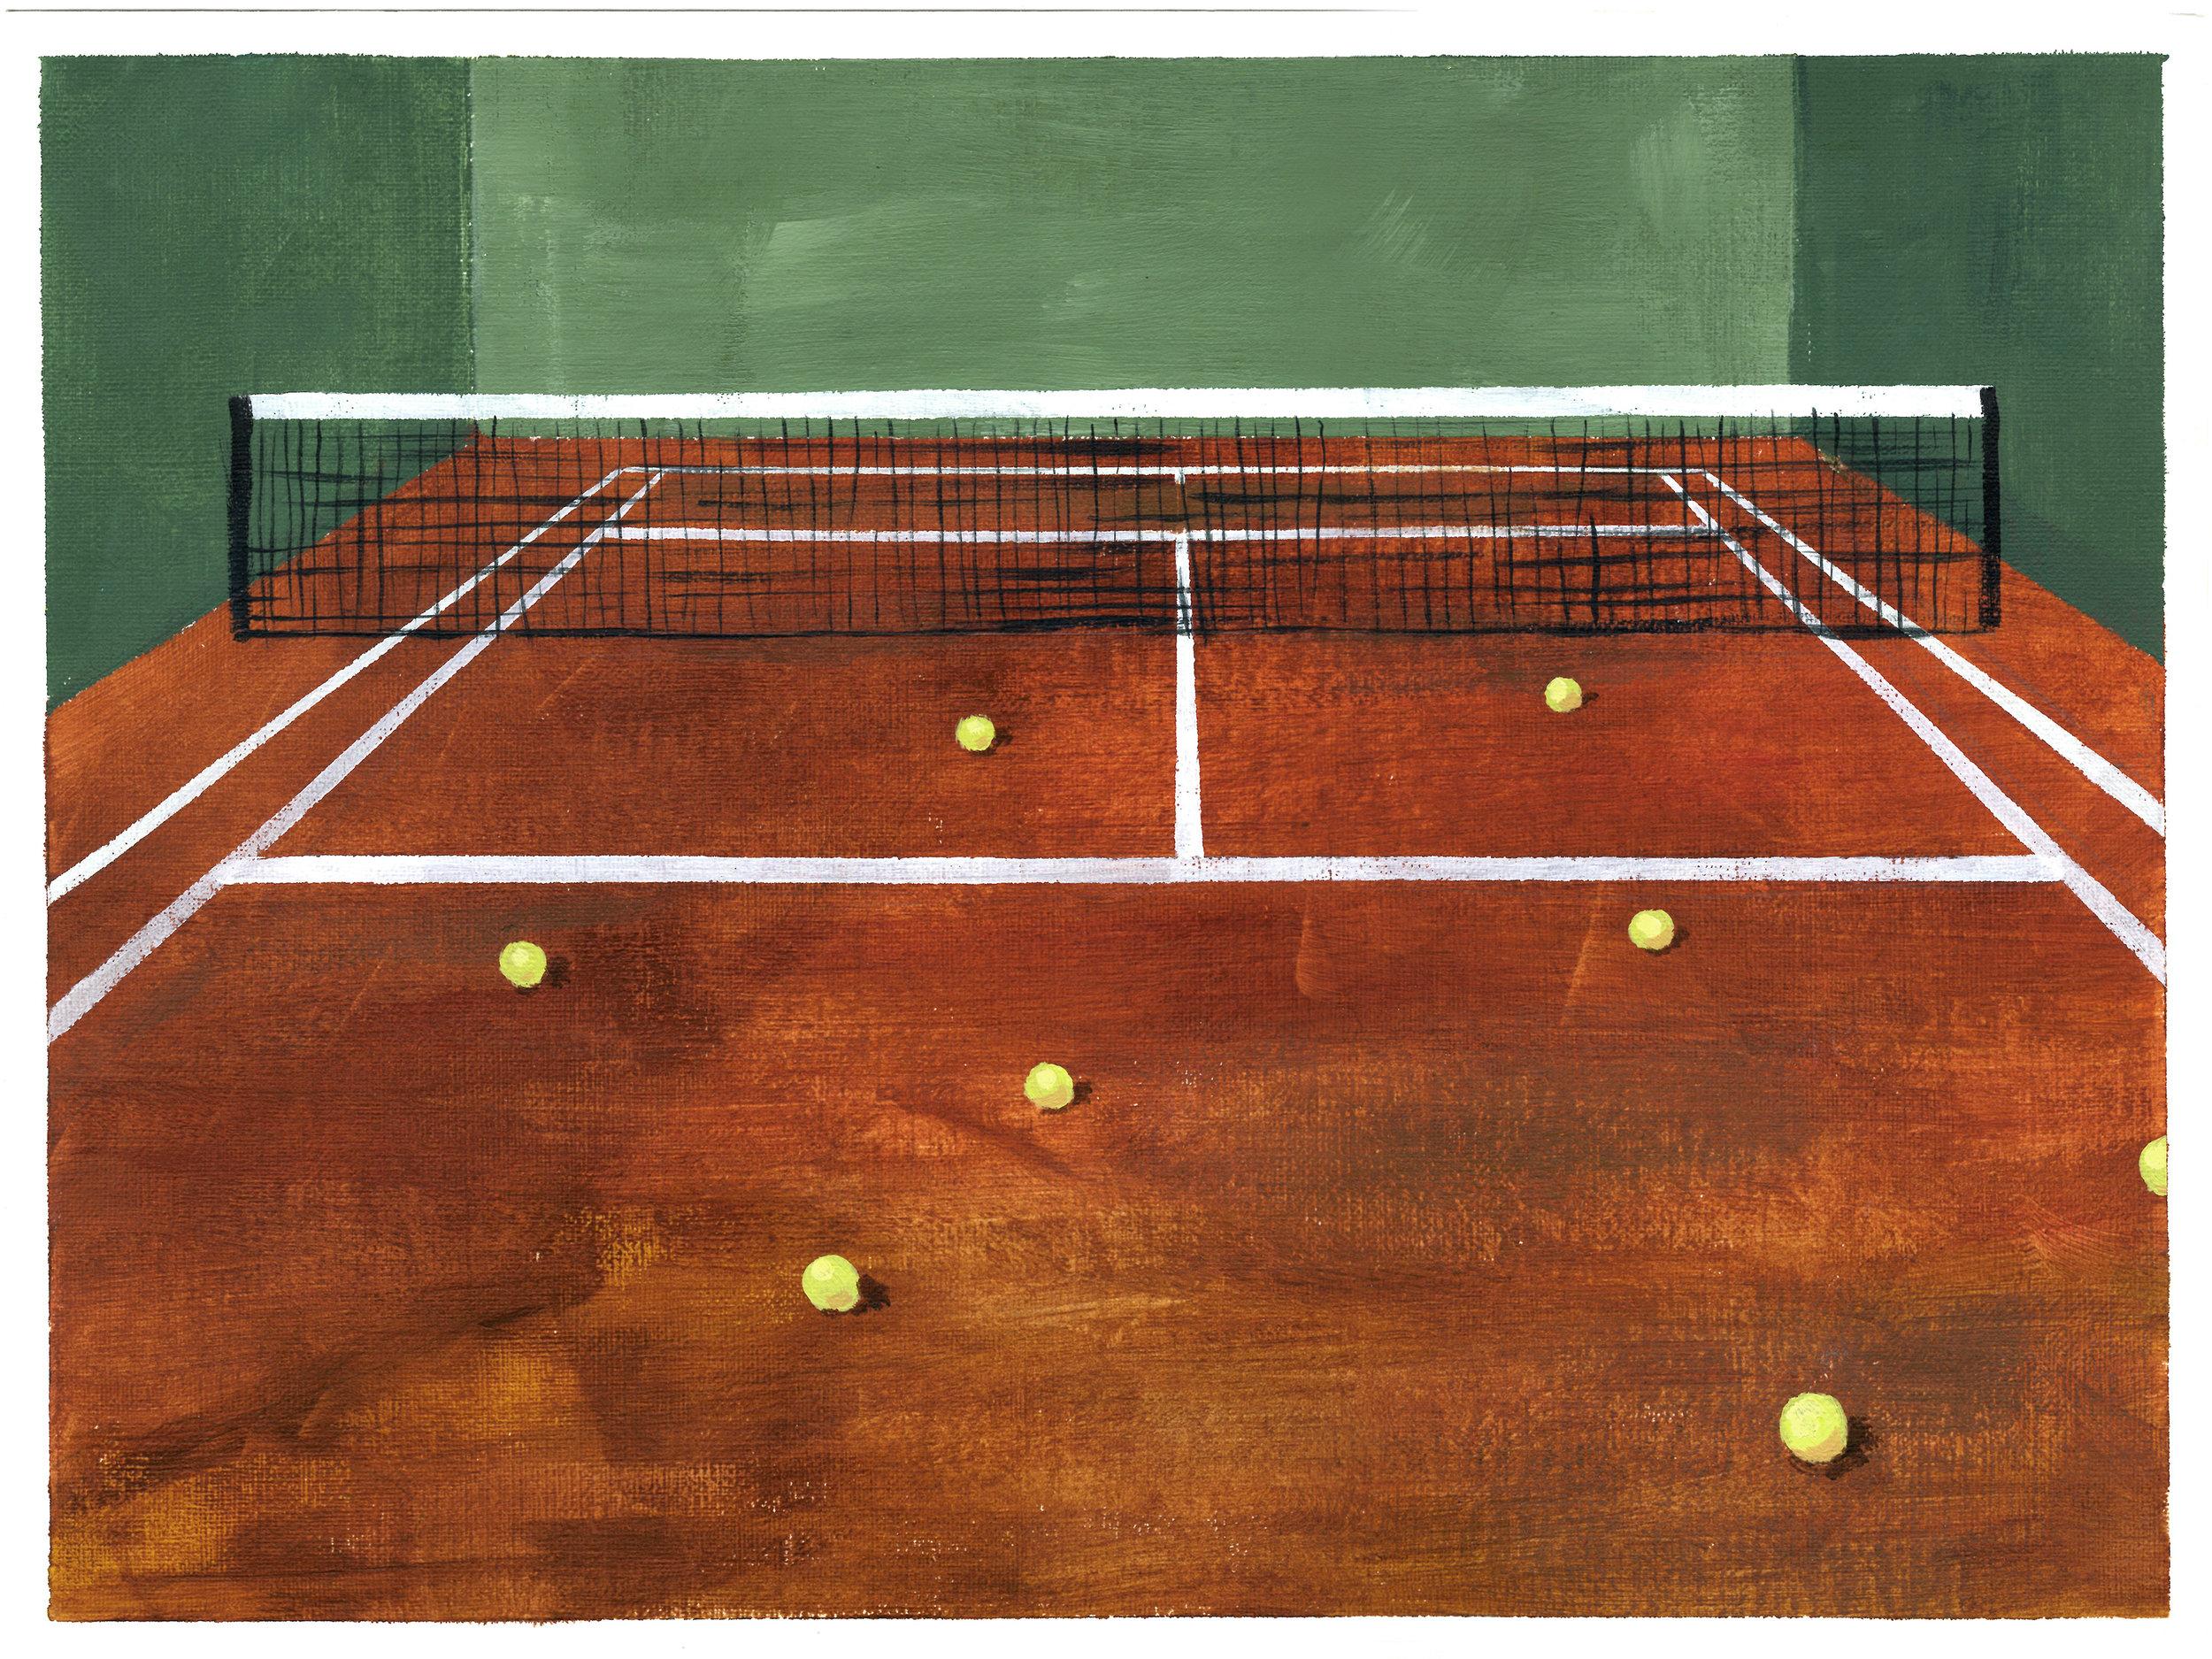 Tennis, 9 x 12 in.